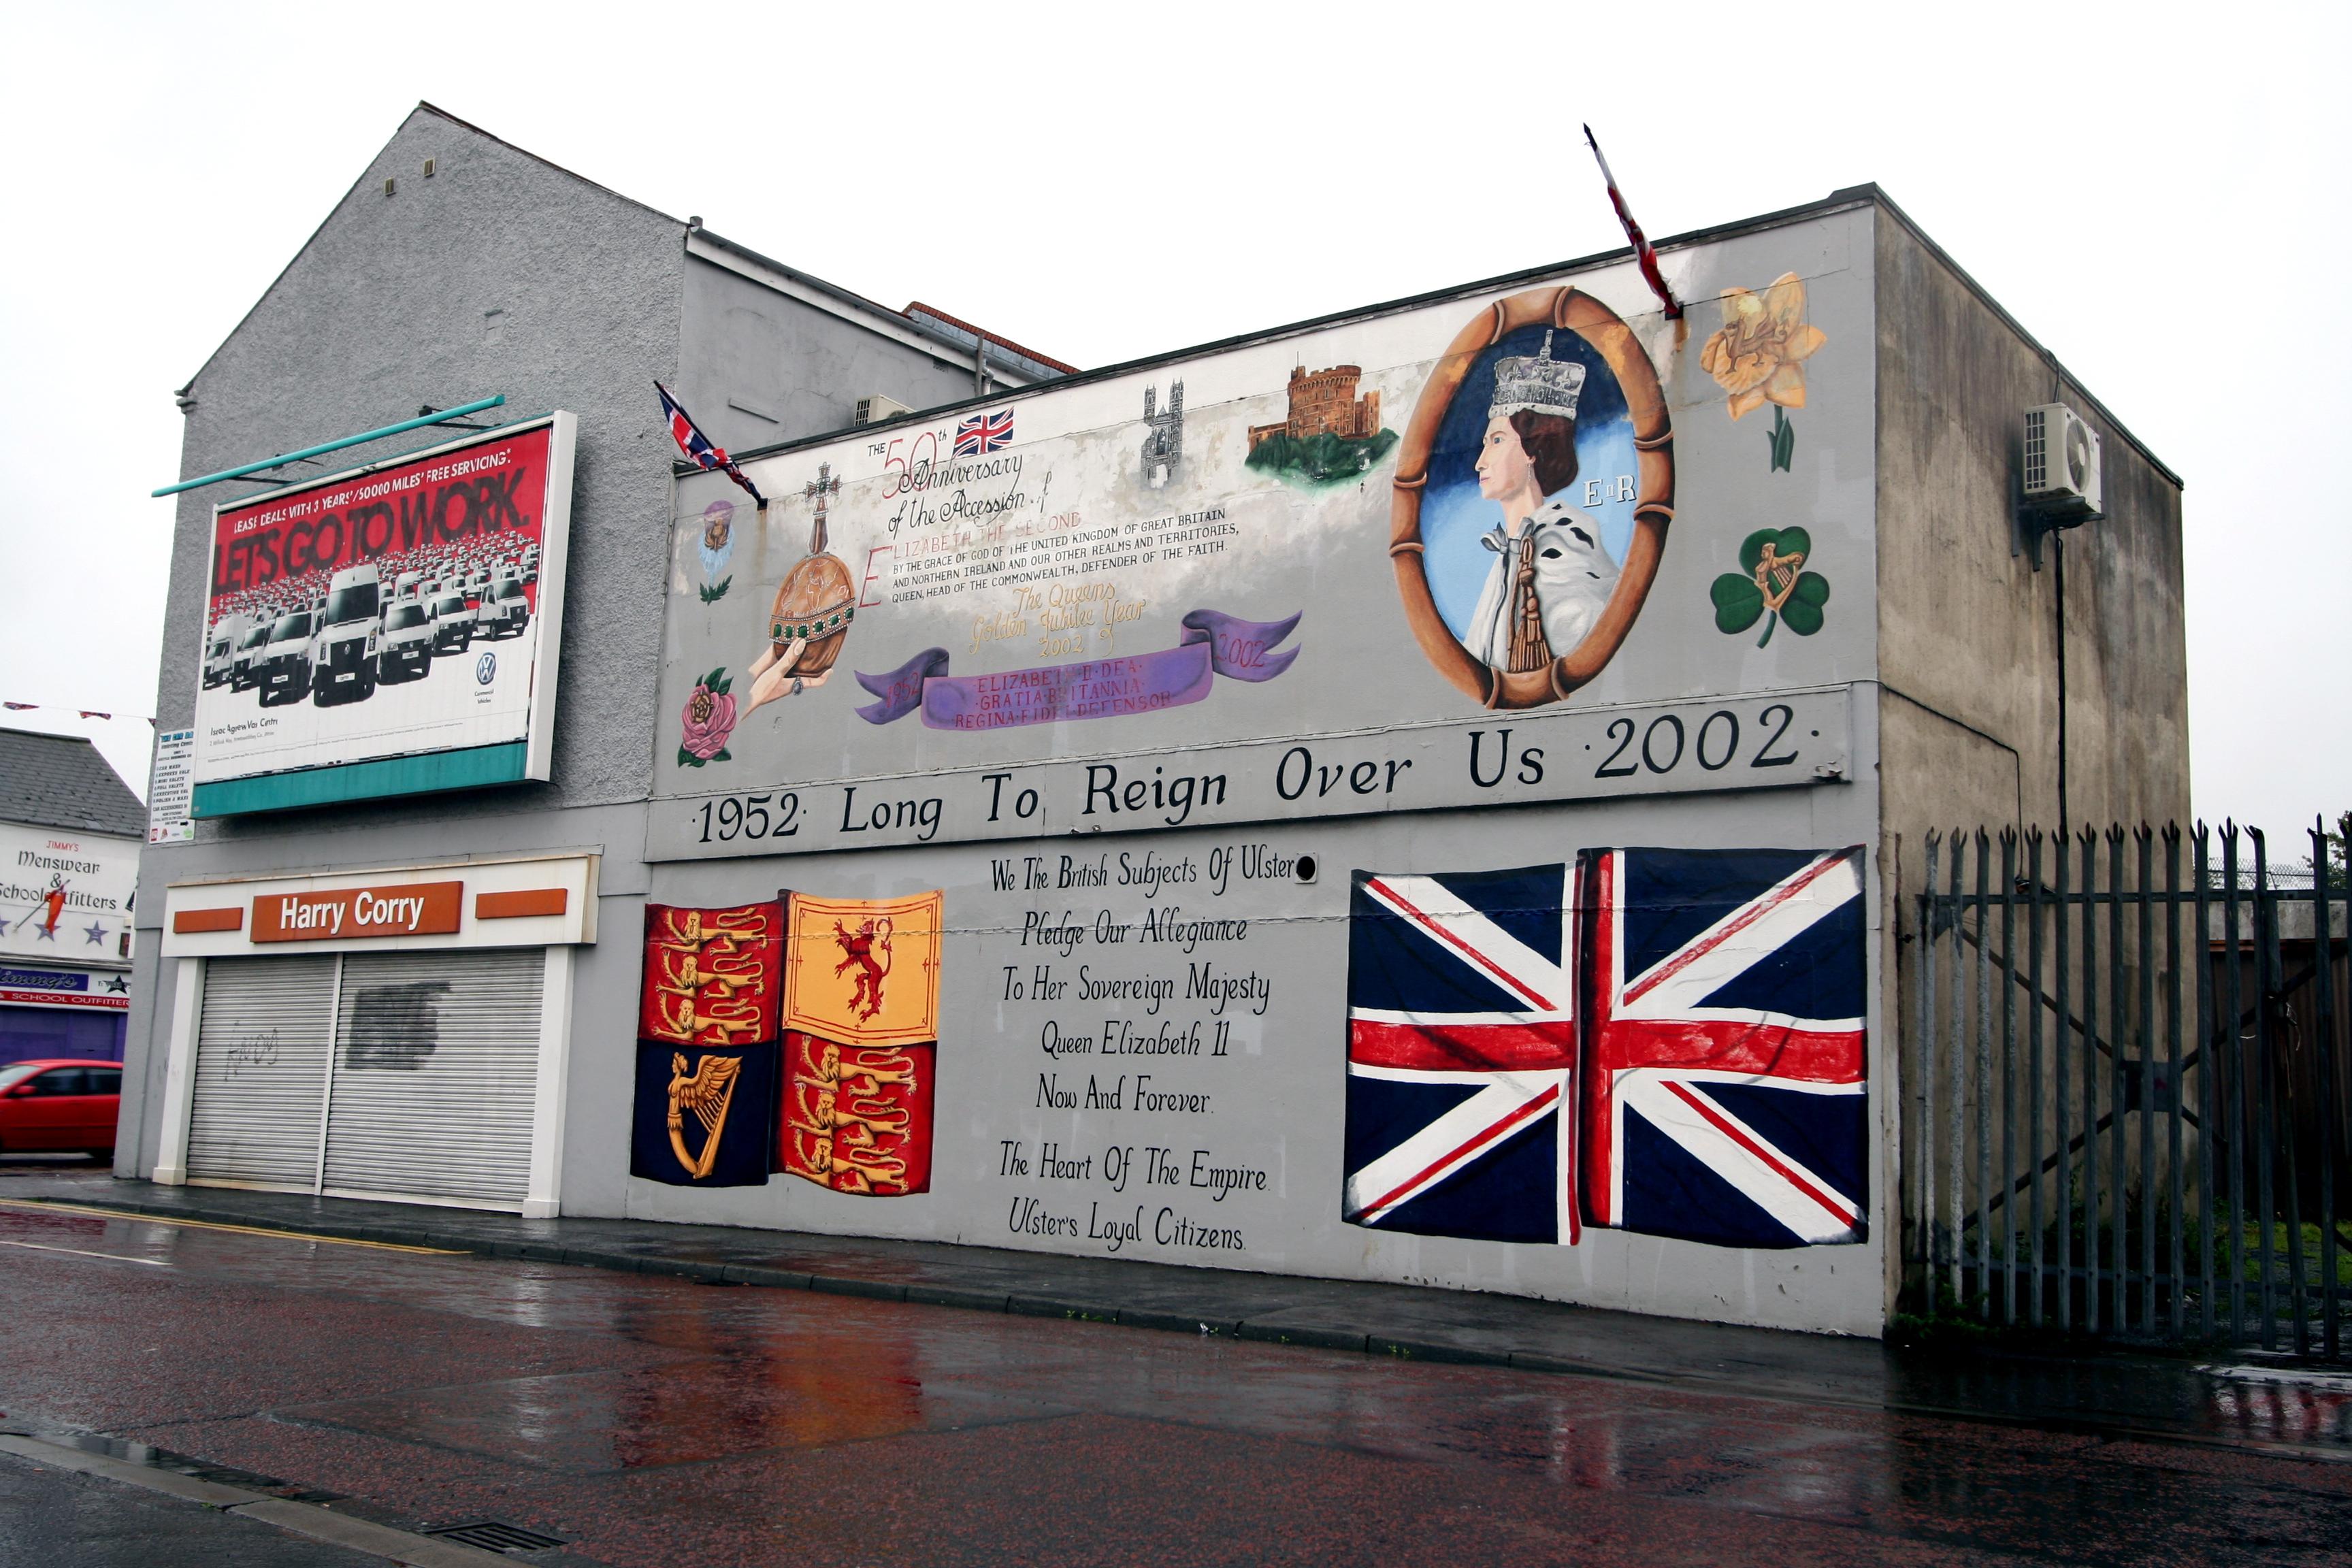 File:Belfast murals Ac.jpg - Wikimedia Commons